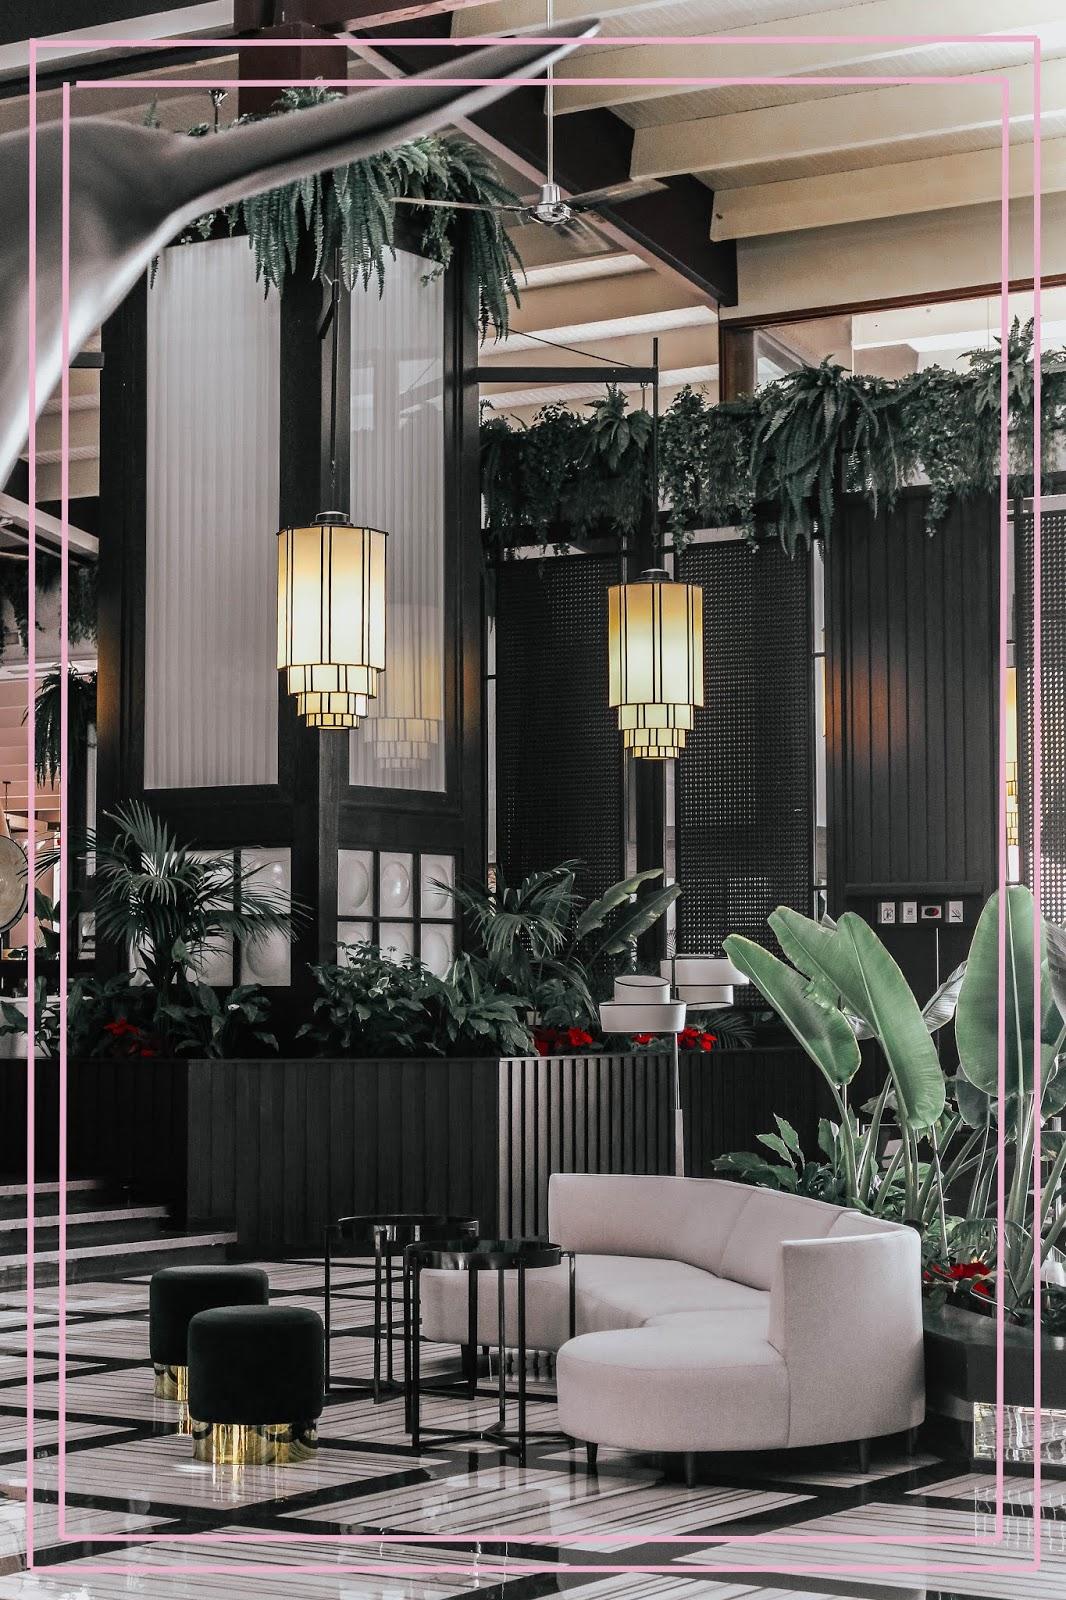 H10 Rubicon Palace Hotel Lobby Interior Design